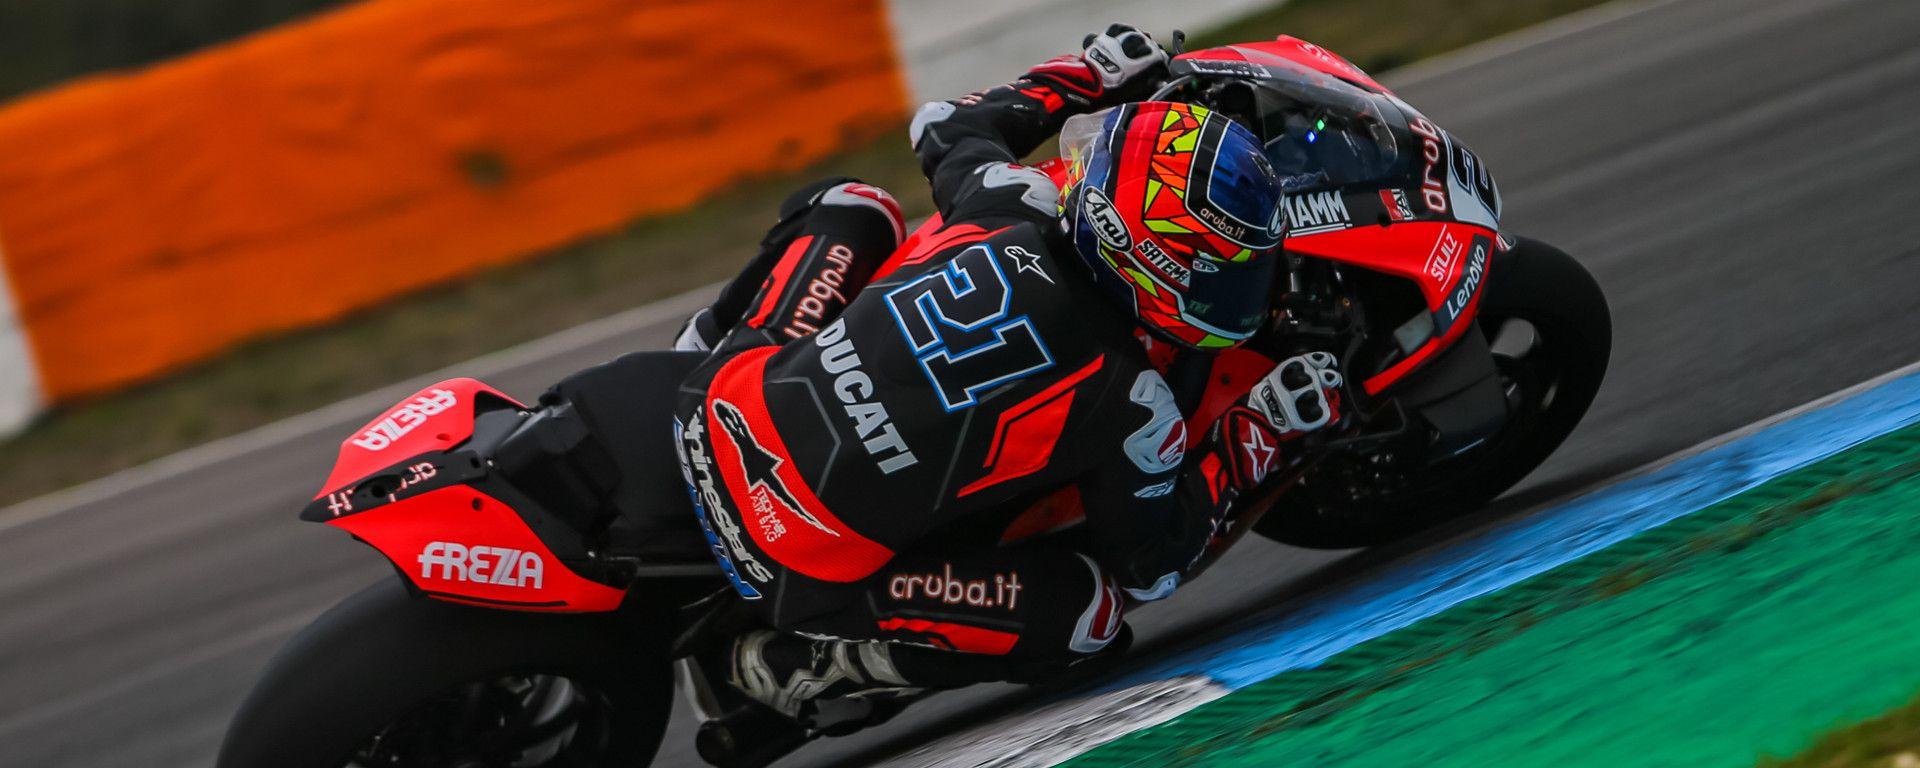 Superbike, Test Estoril 2020, Michael Ruben Rinaldi (Ducati)